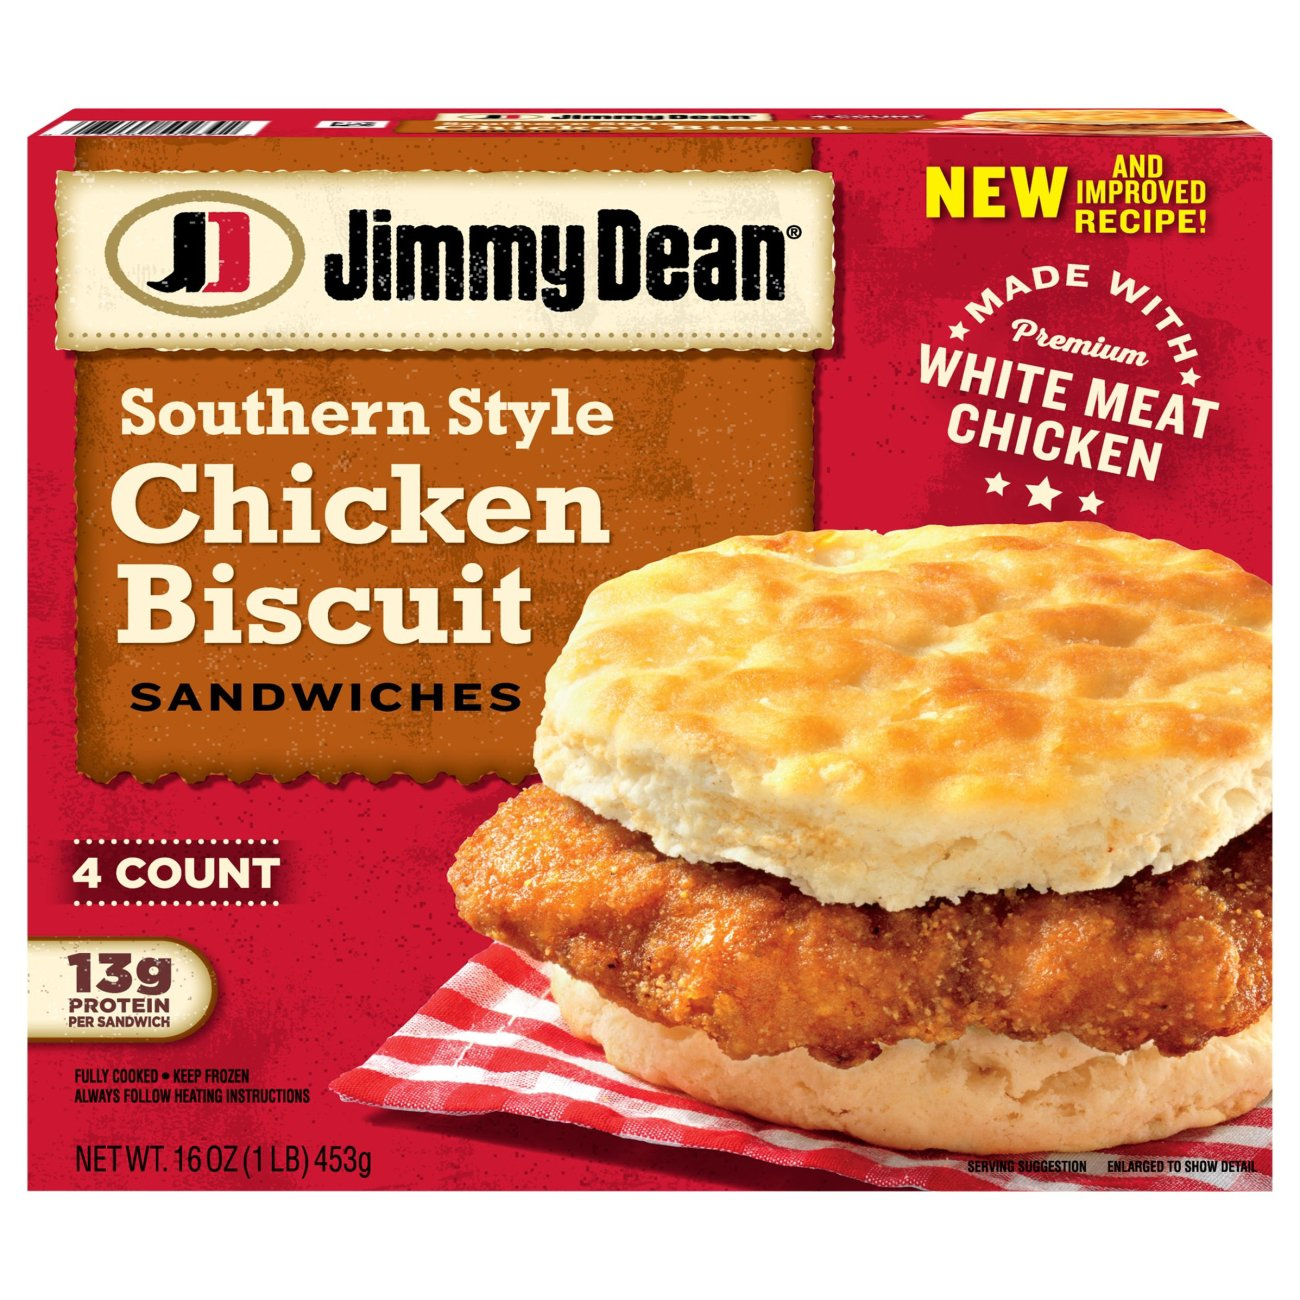 Jimmy Dean Southern-Style Chicken